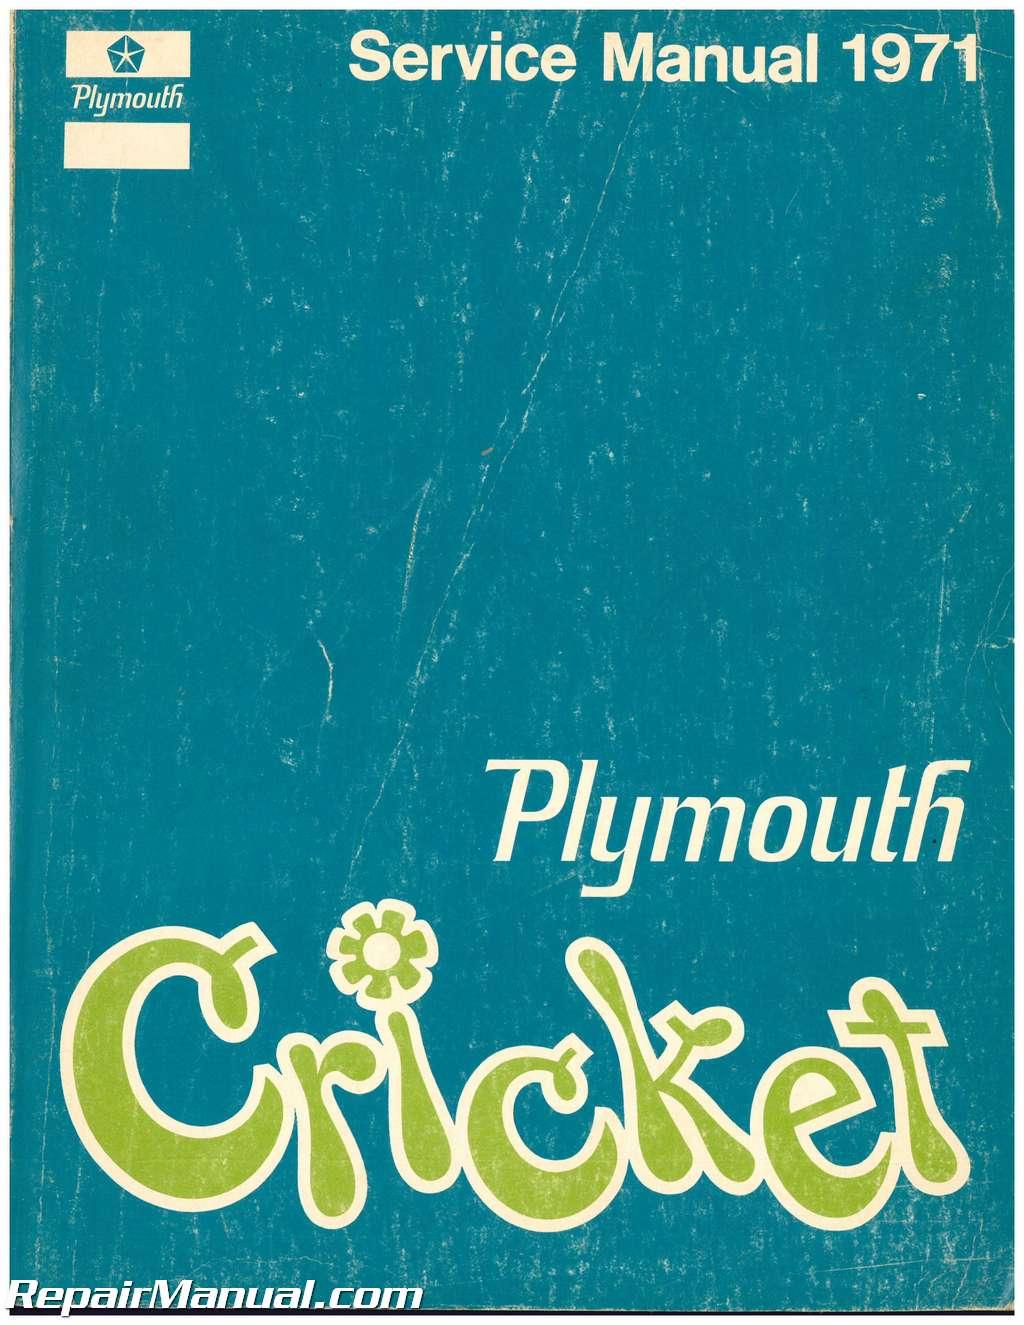 manual cricket scoreboards for sale